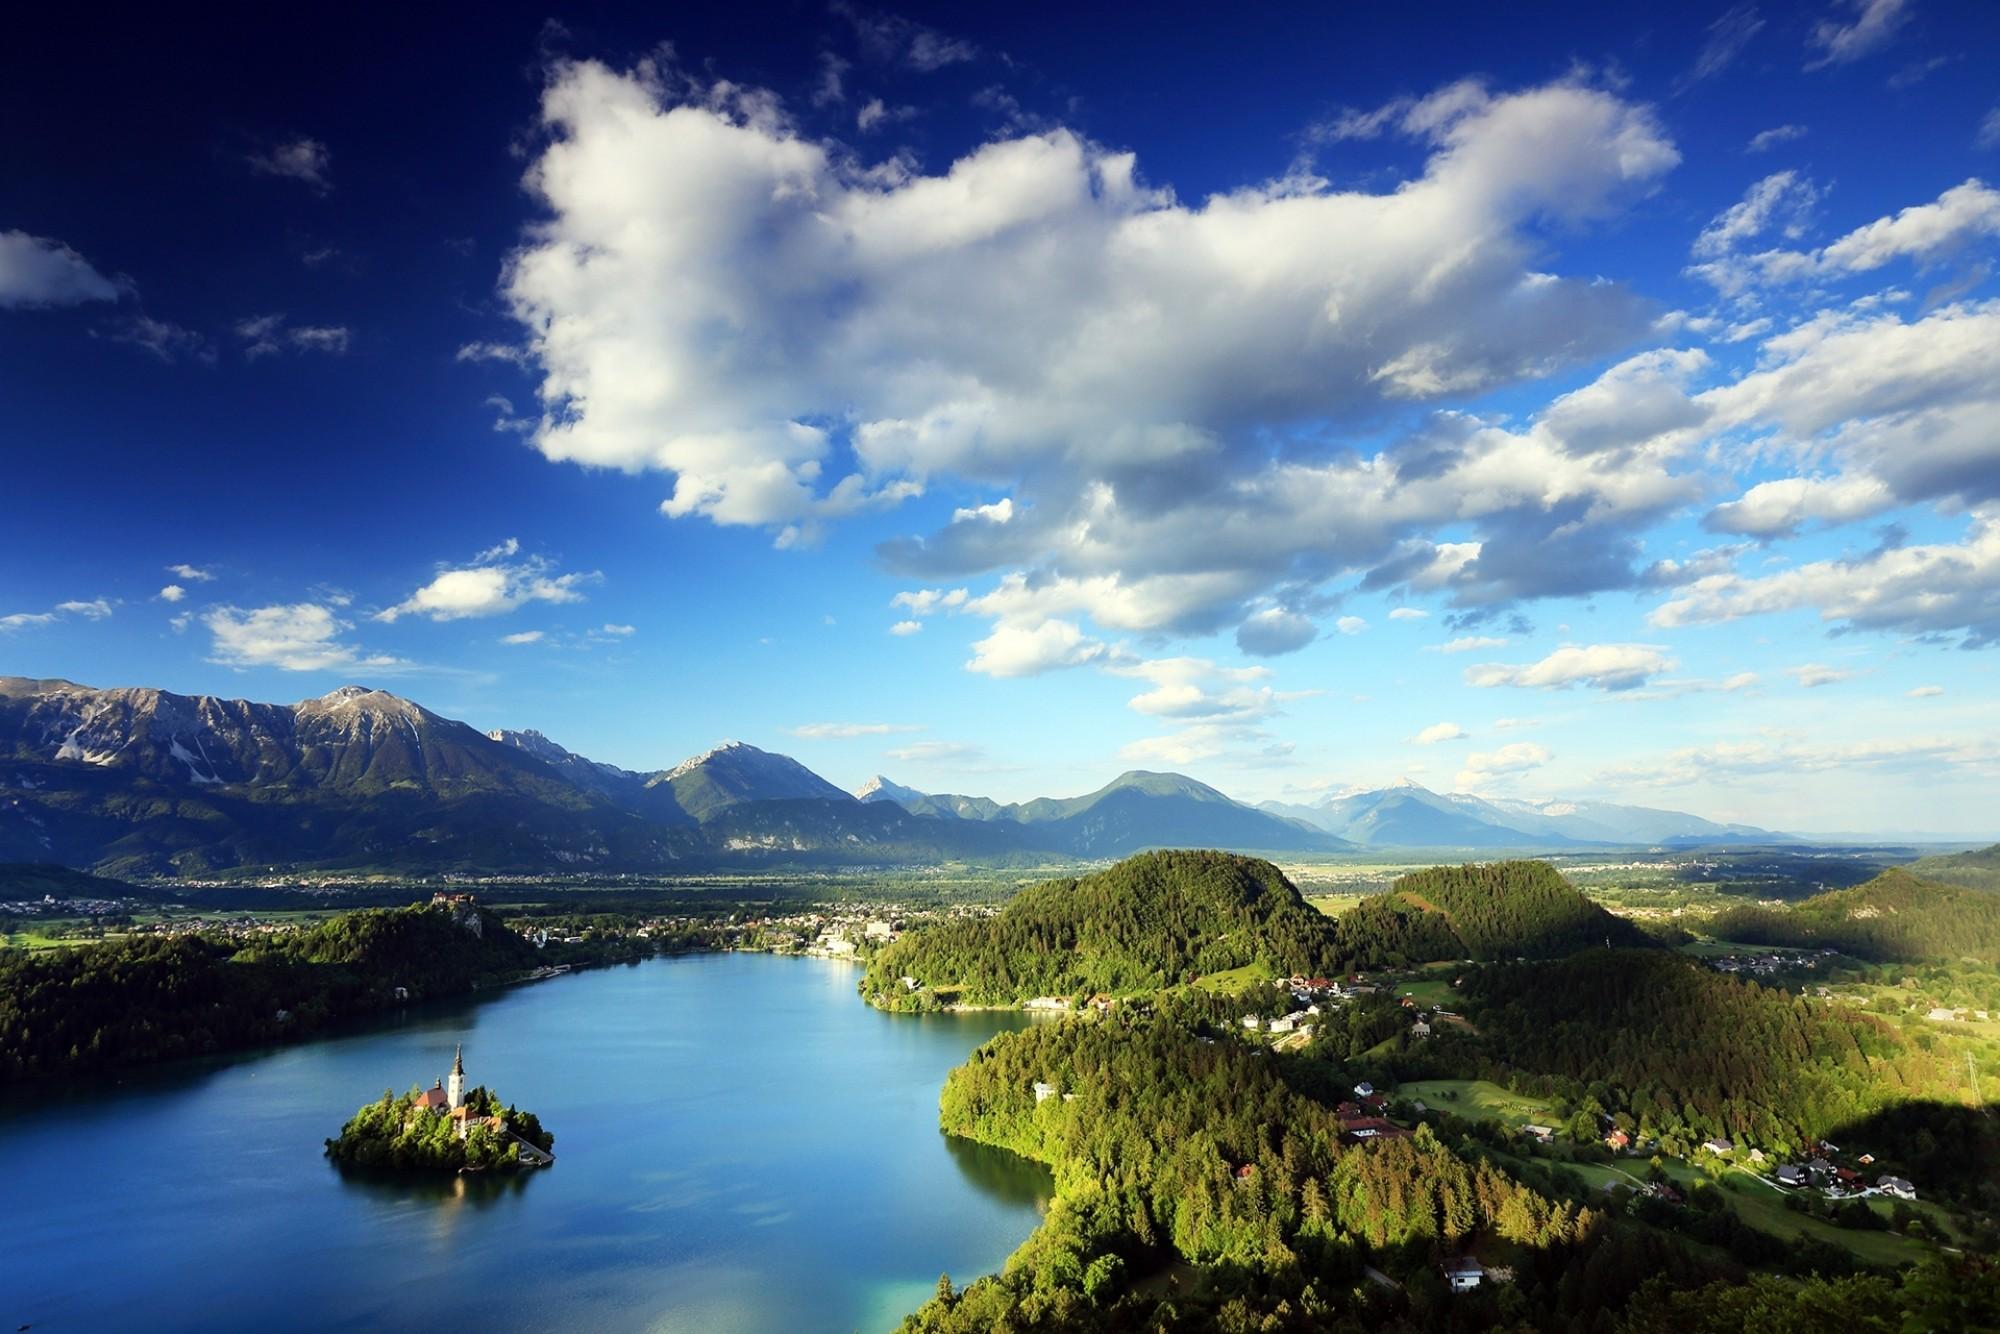 Bled-Lake-Slovenia-Europe